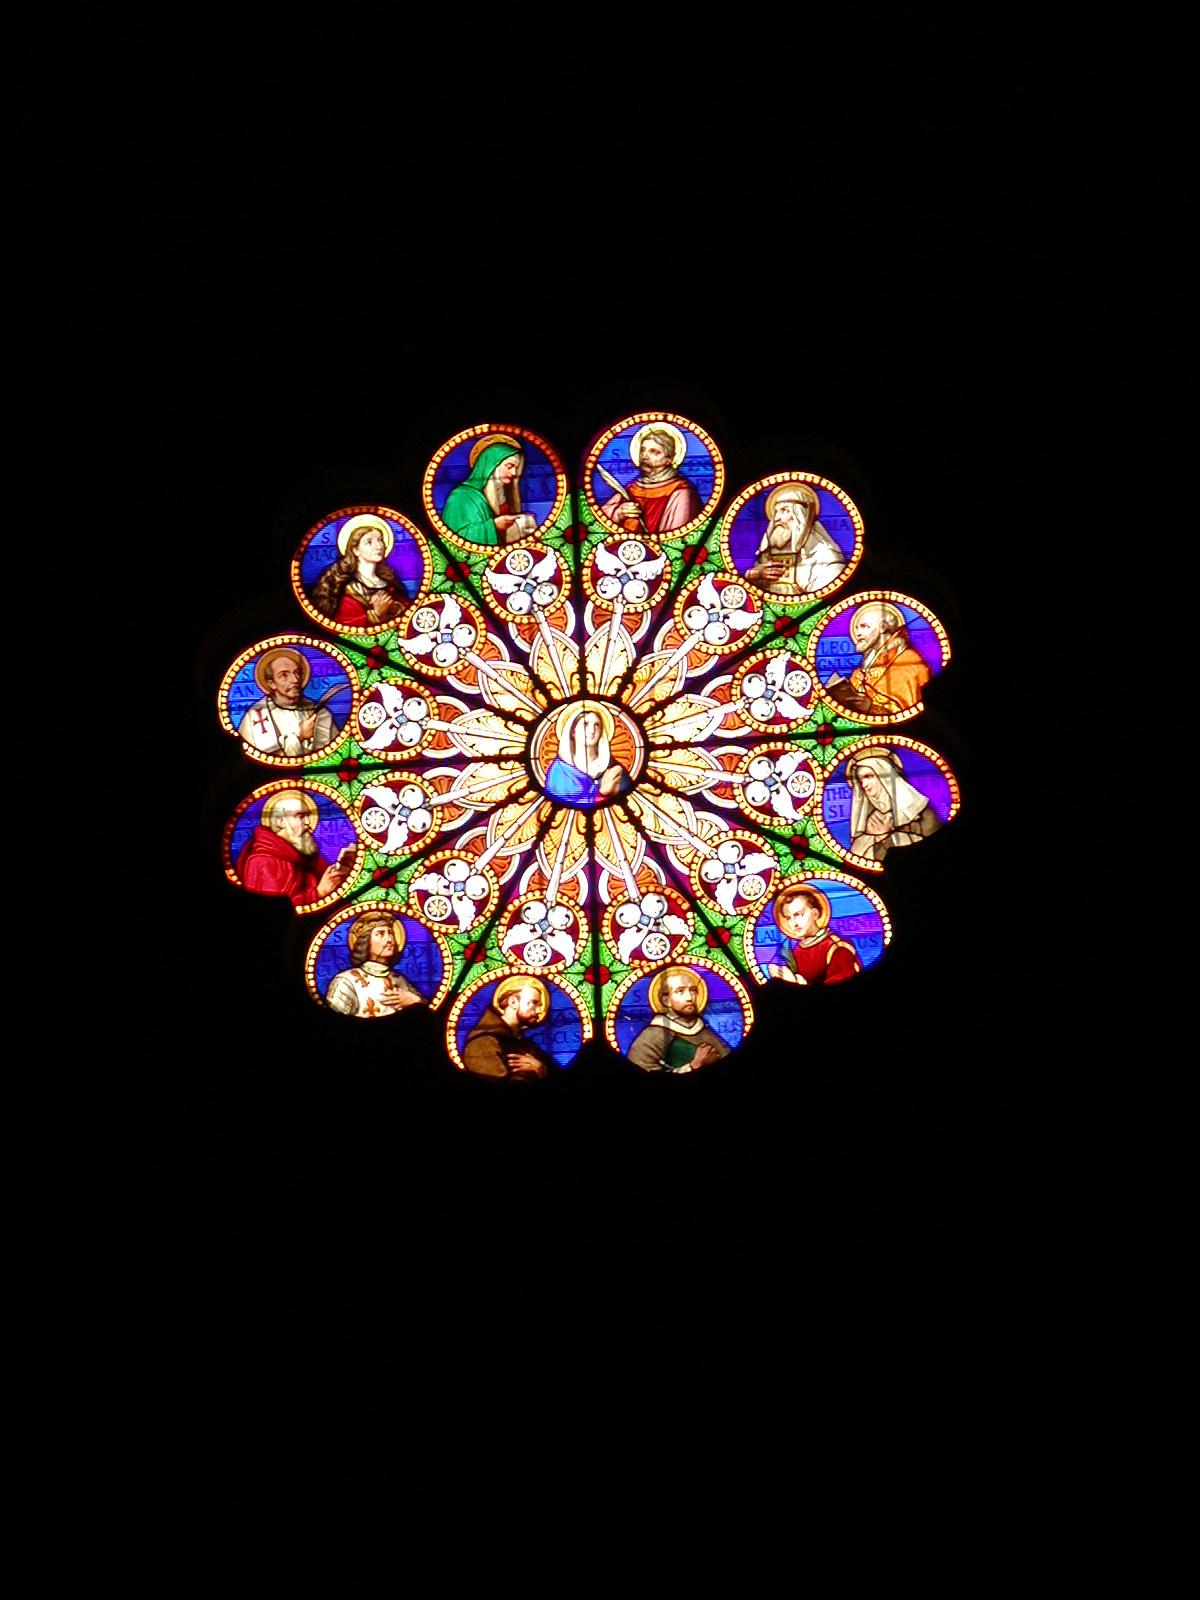 Santa Maria sopra Minerva - 2002-09-06-181441